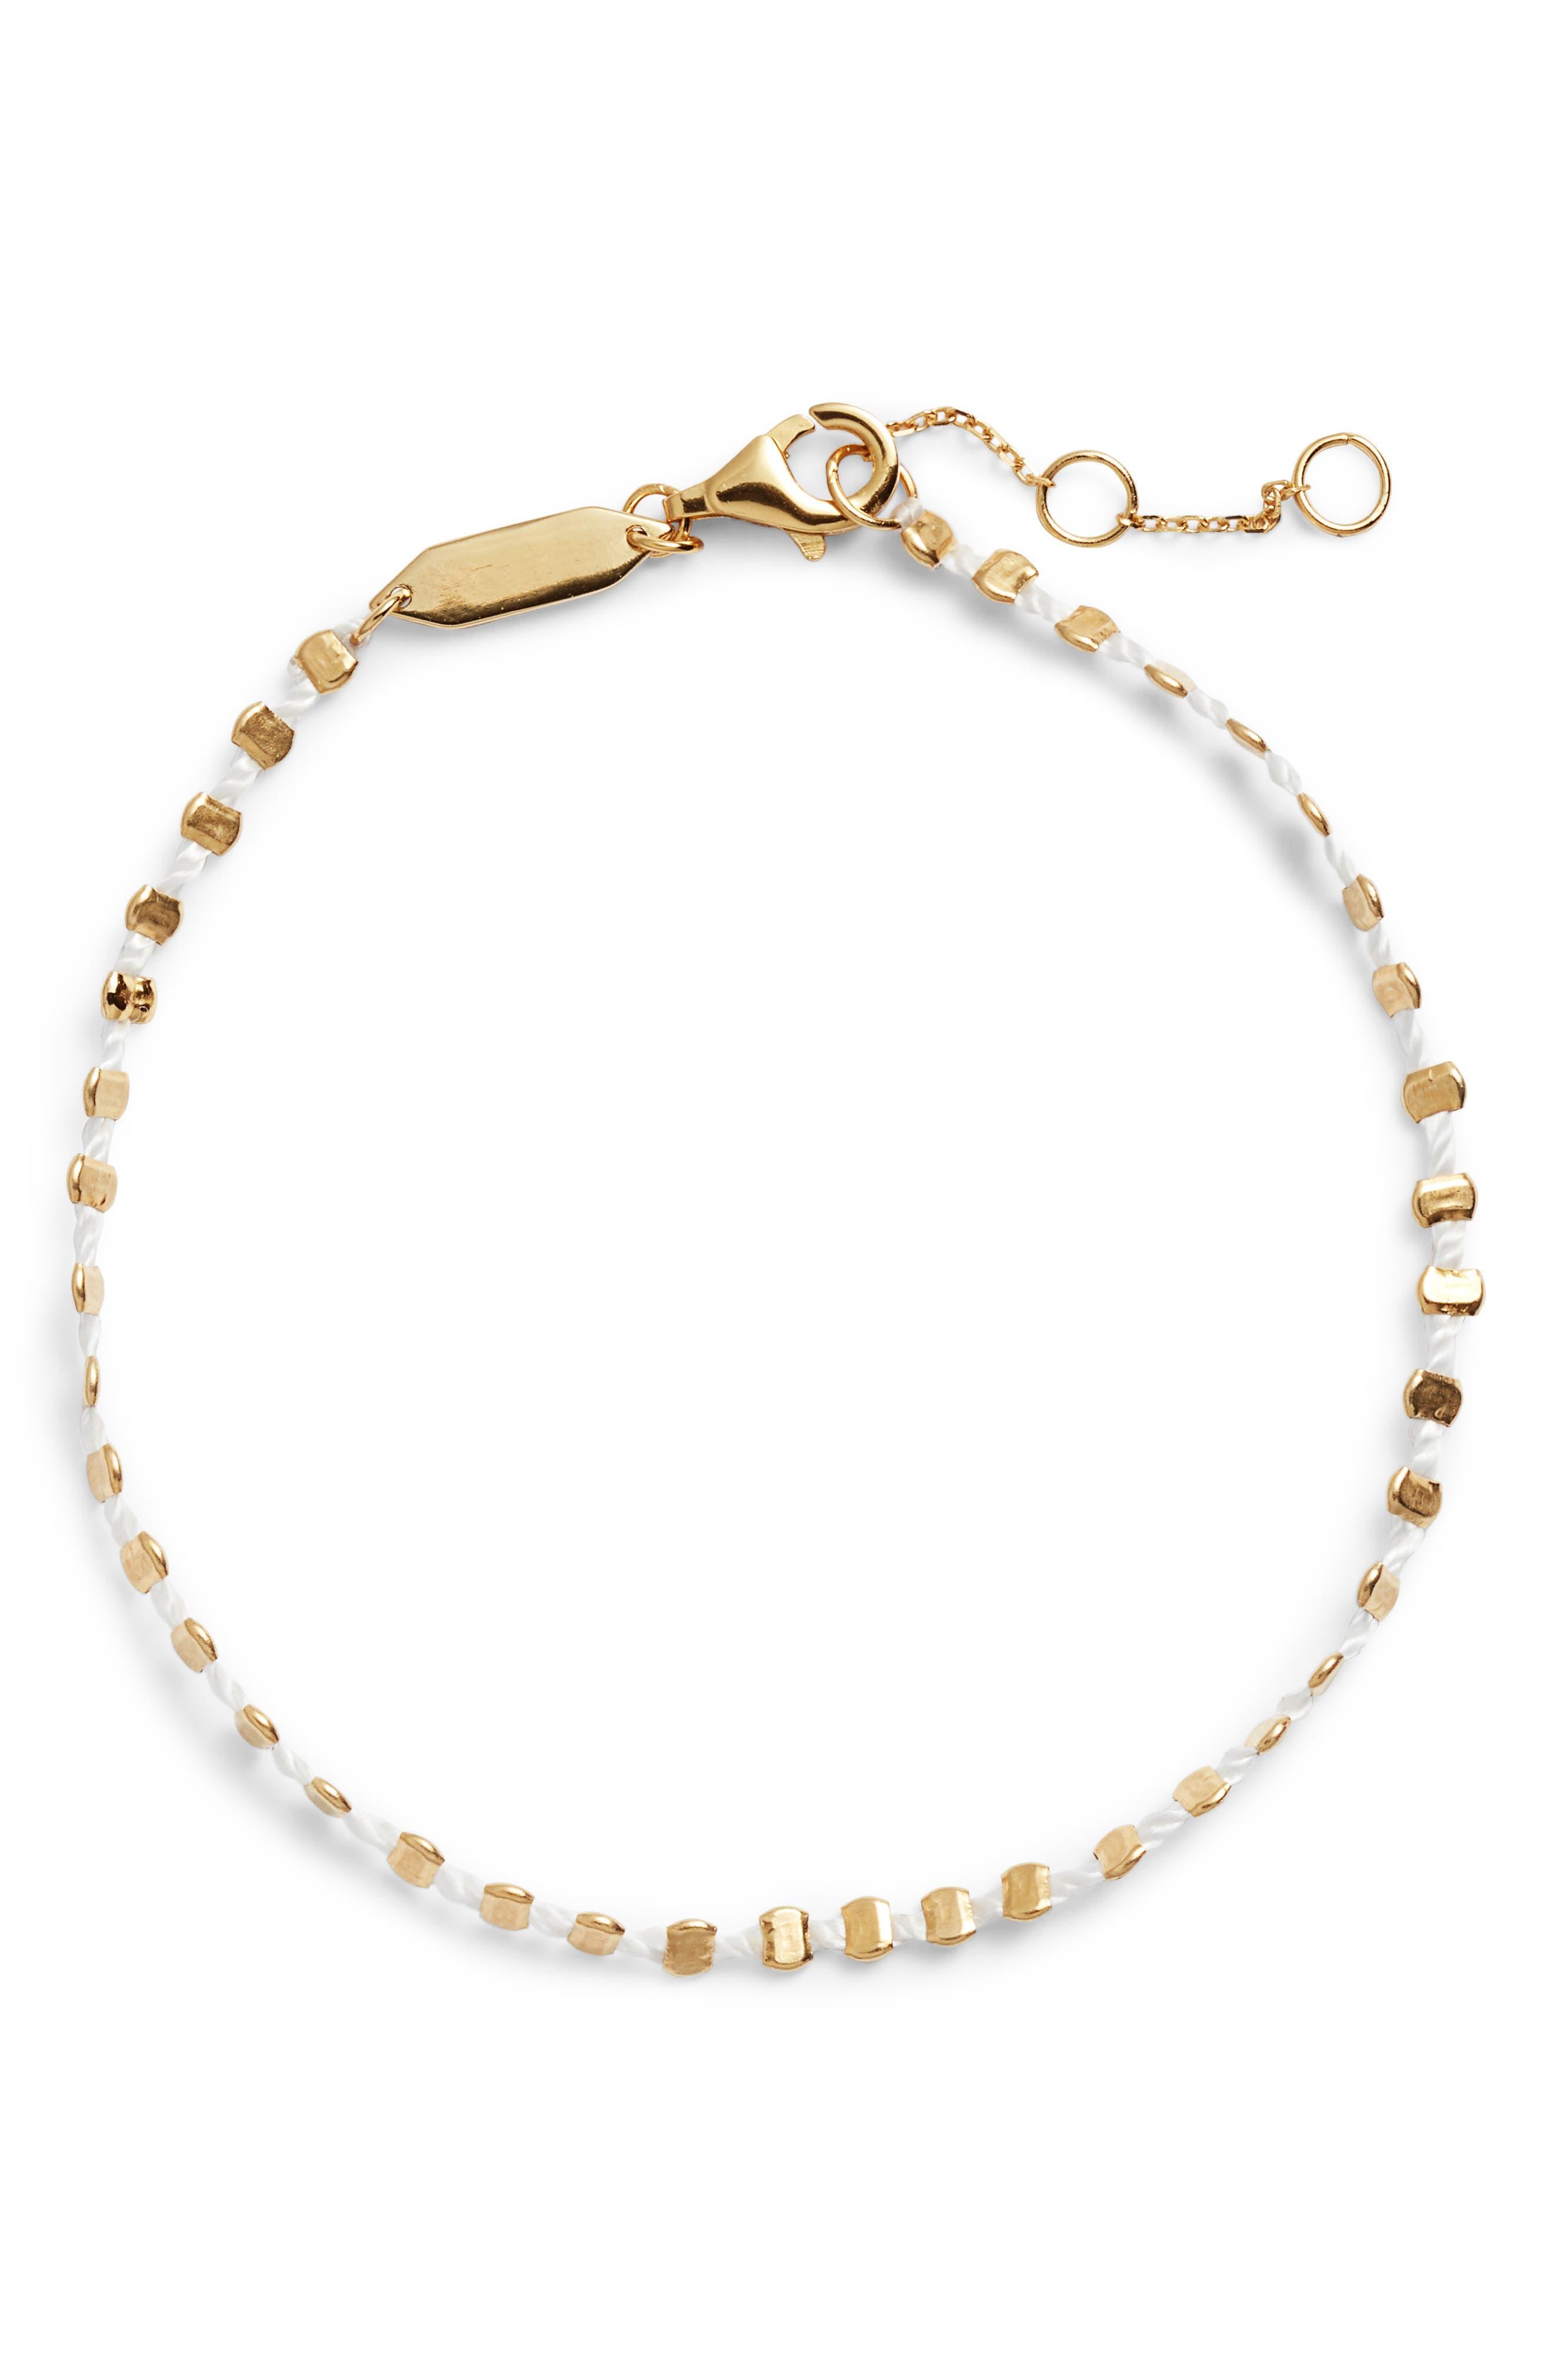 Sydney Beaded Rope Bracelet,                             Main thumbnail 1, color,                             Gold